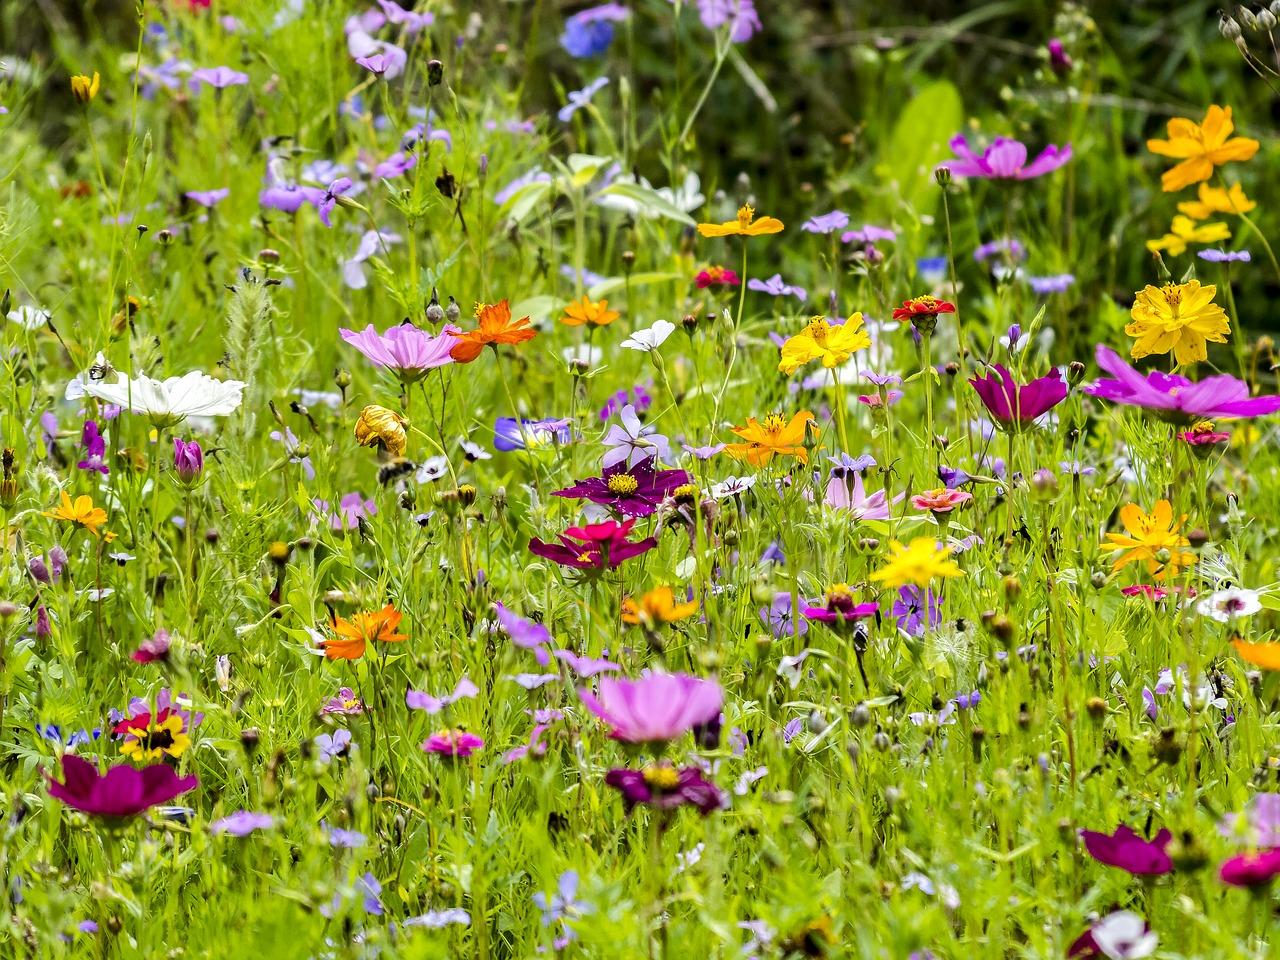 Blühendes Leben-flower-2397985_1280